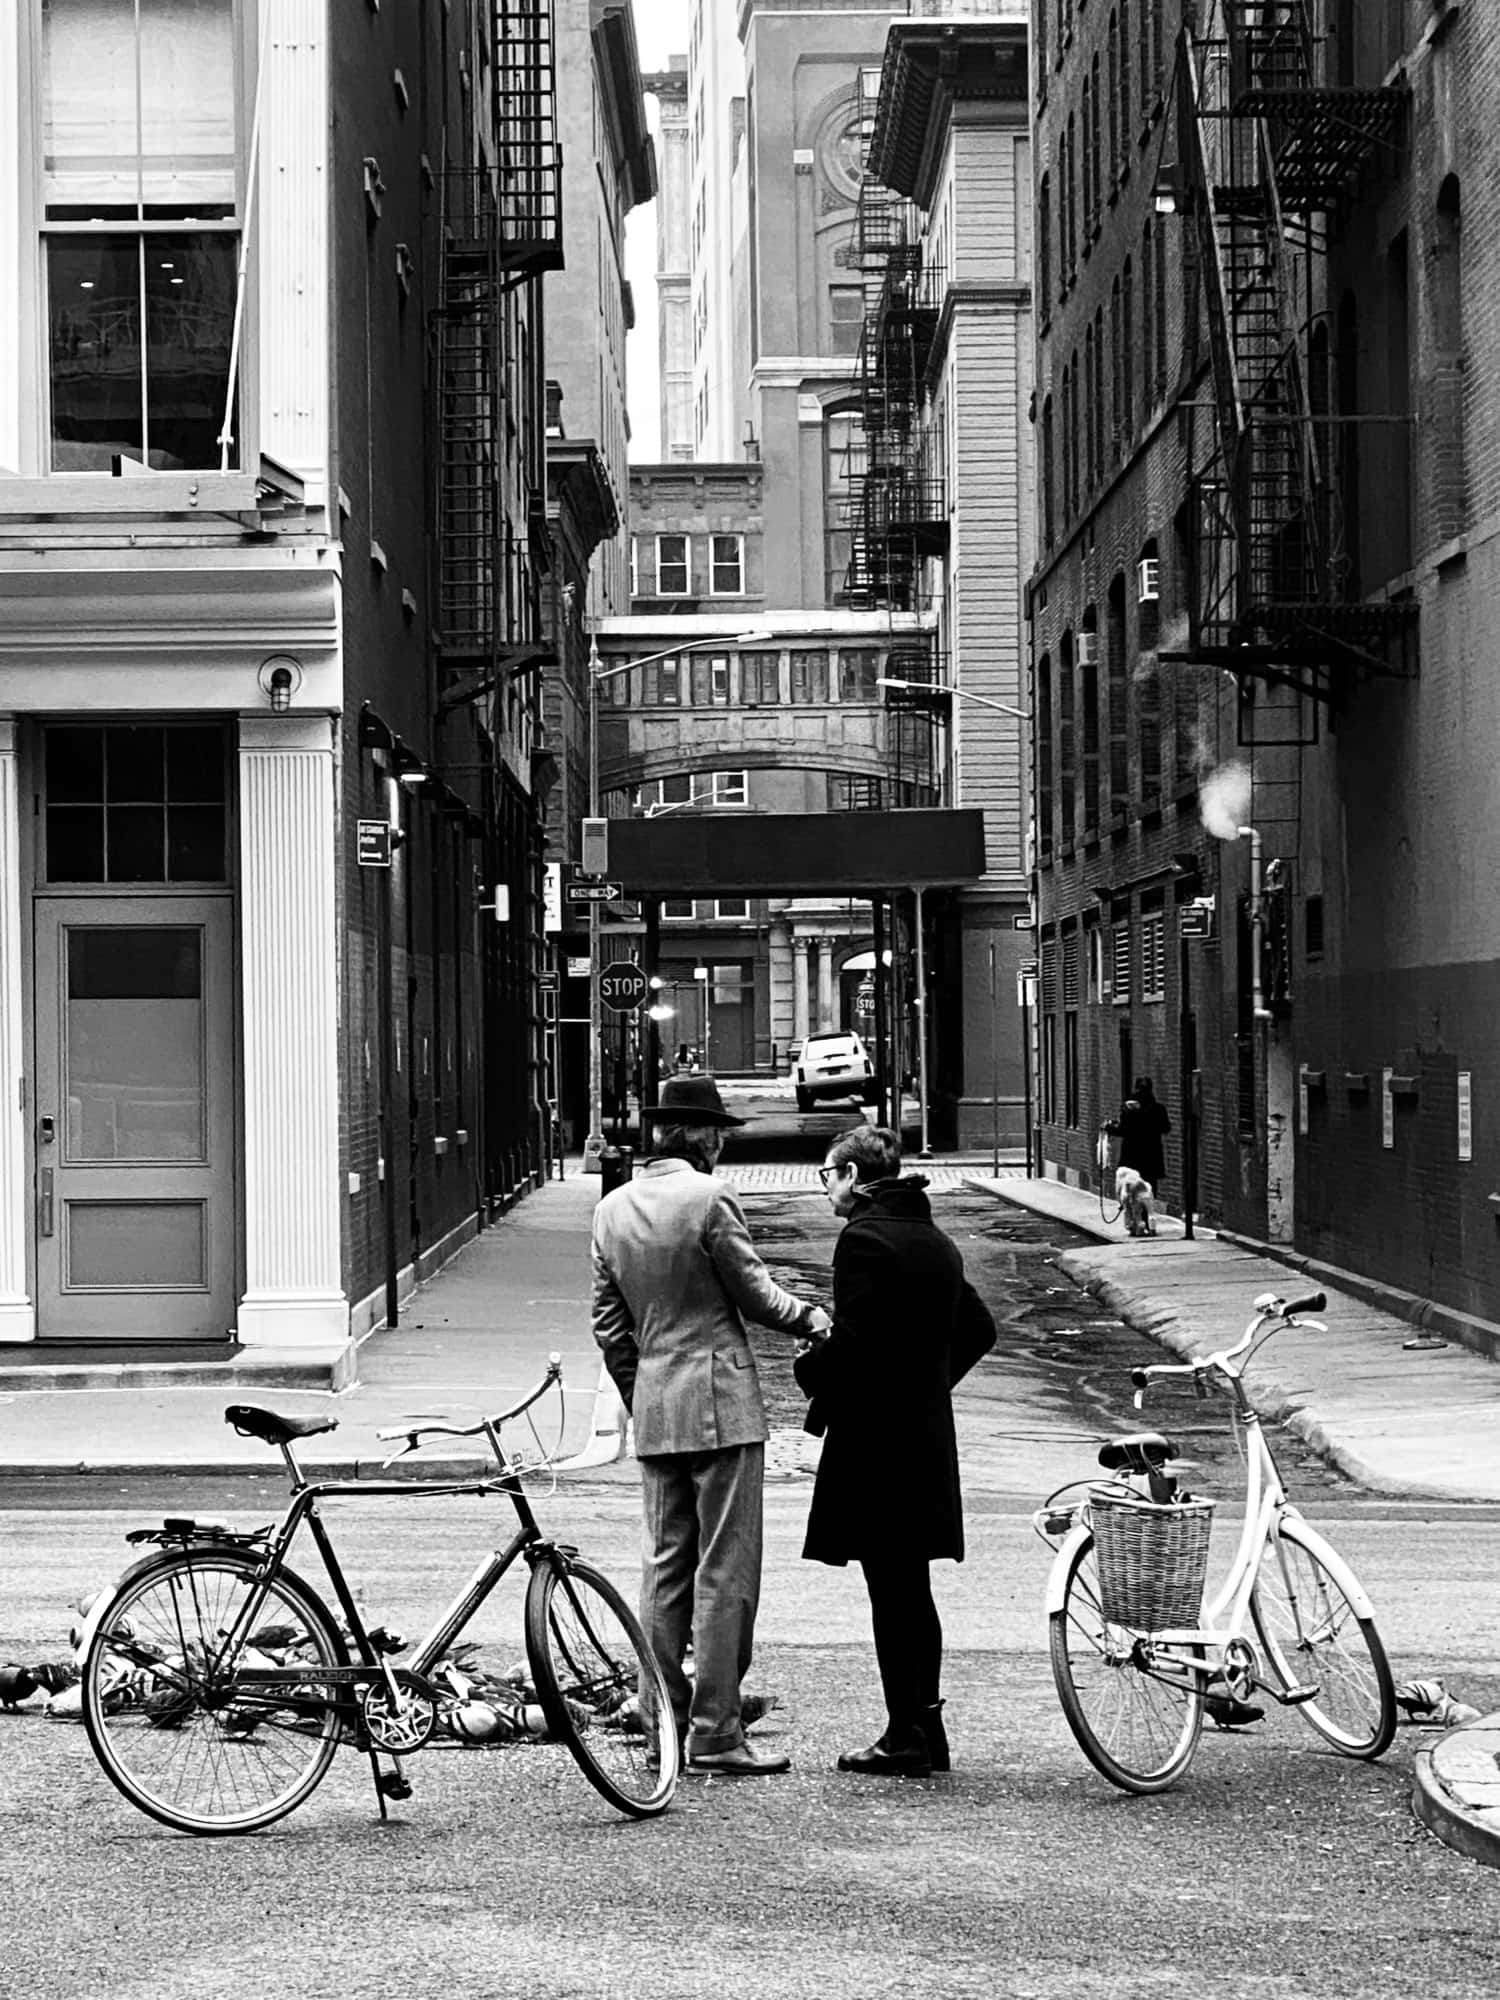 Guide to Biking in New York City